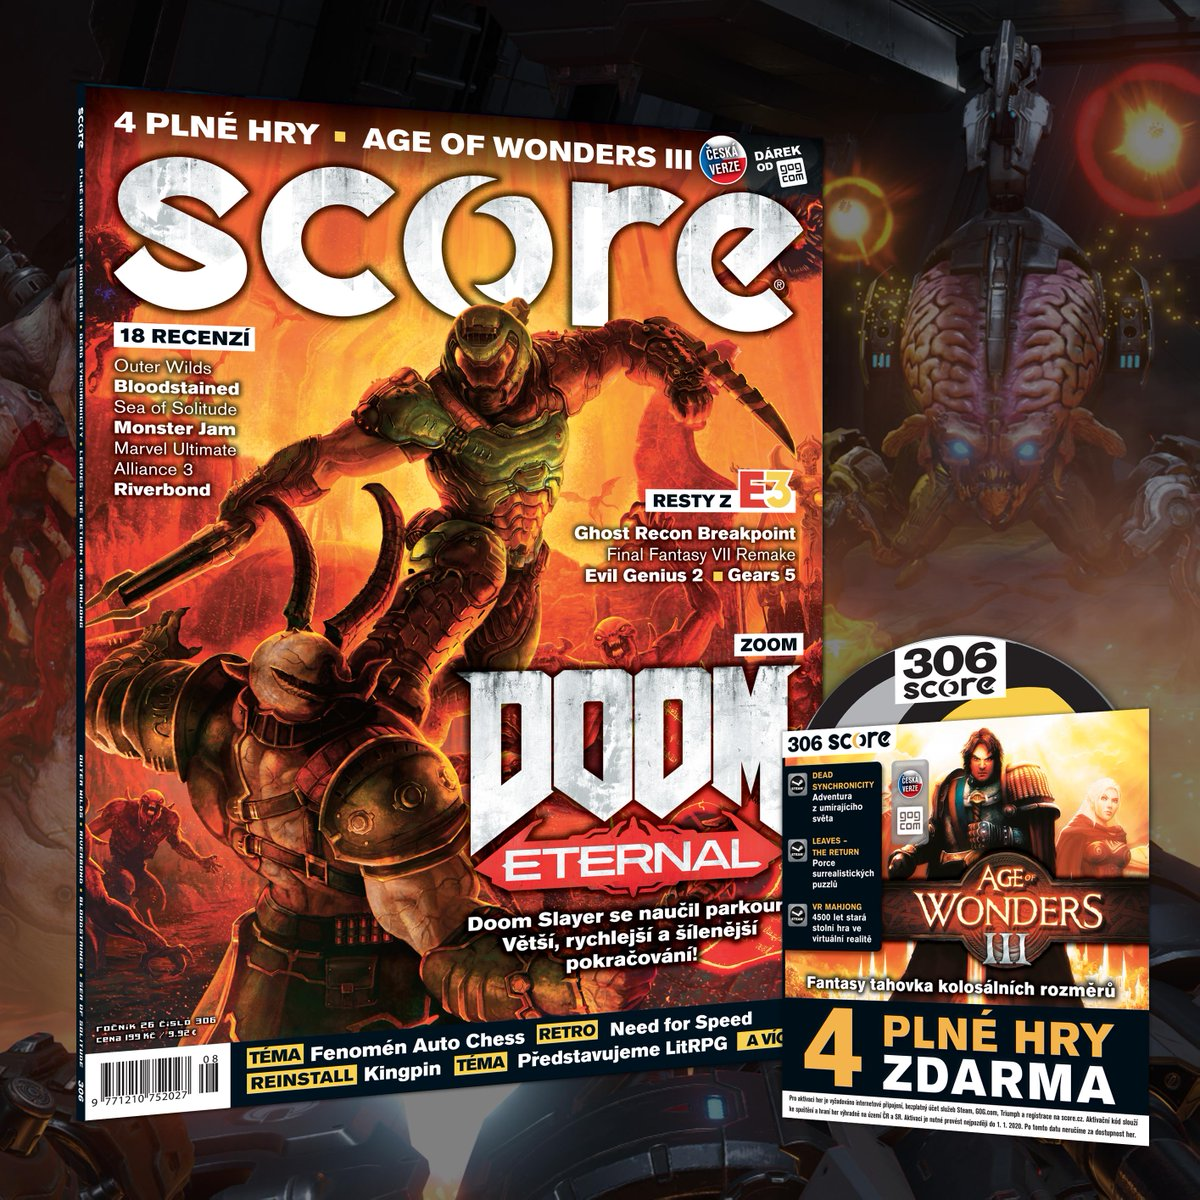 Venku už je nové pekelné SCORE 306. Doom! https://t.co/2nRrvNuhaq